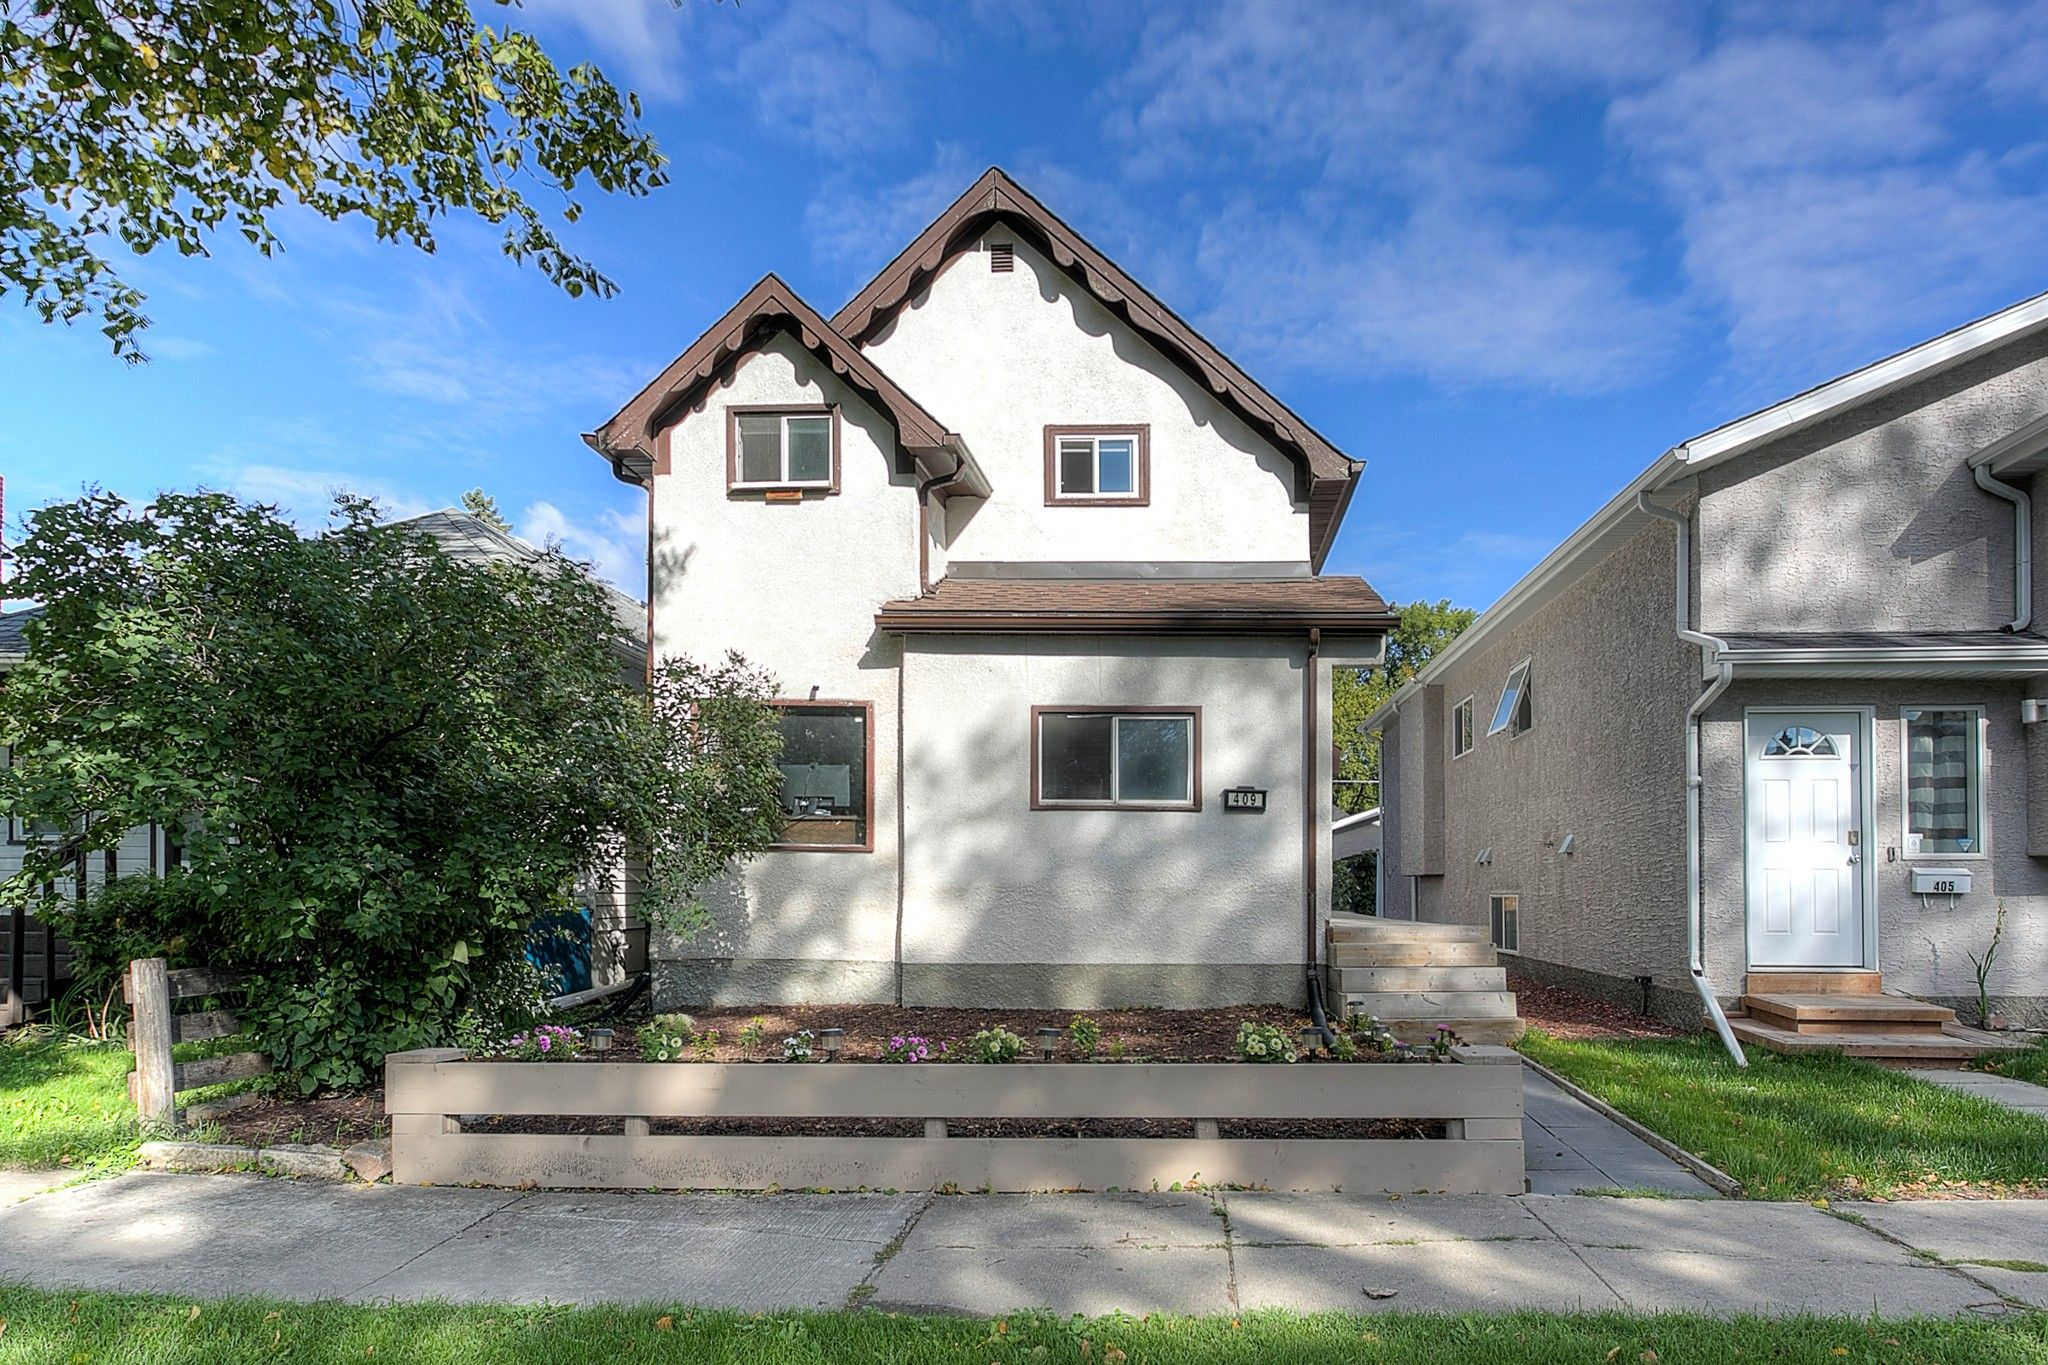 Main Photo: 409 Arnold Street in Winnipeg: Single Family Detached for sale : MLS®# 202122590